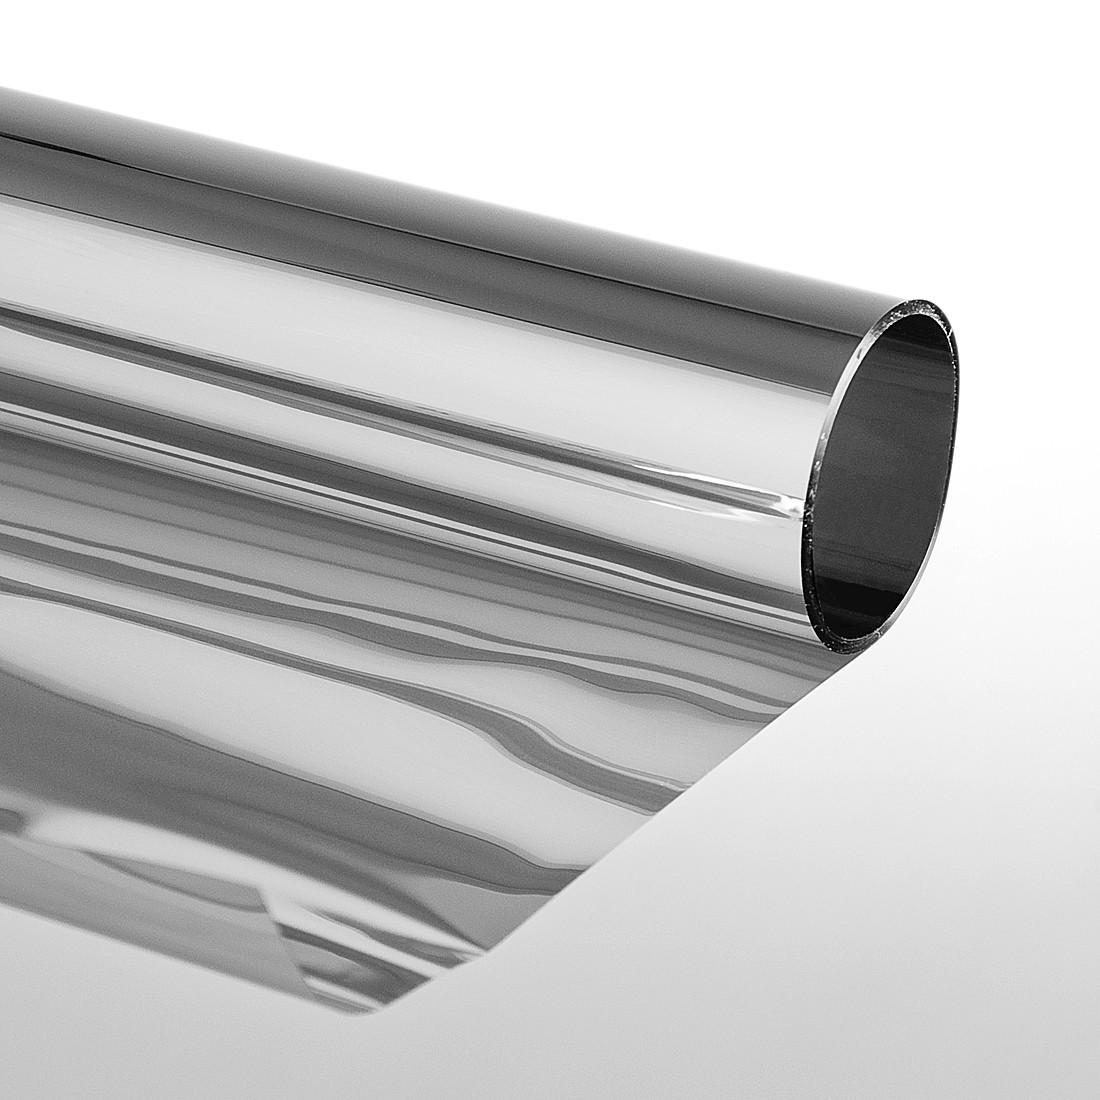 Extrem Pellicola Solare Adesiva Per Vetro Finestra Effetto